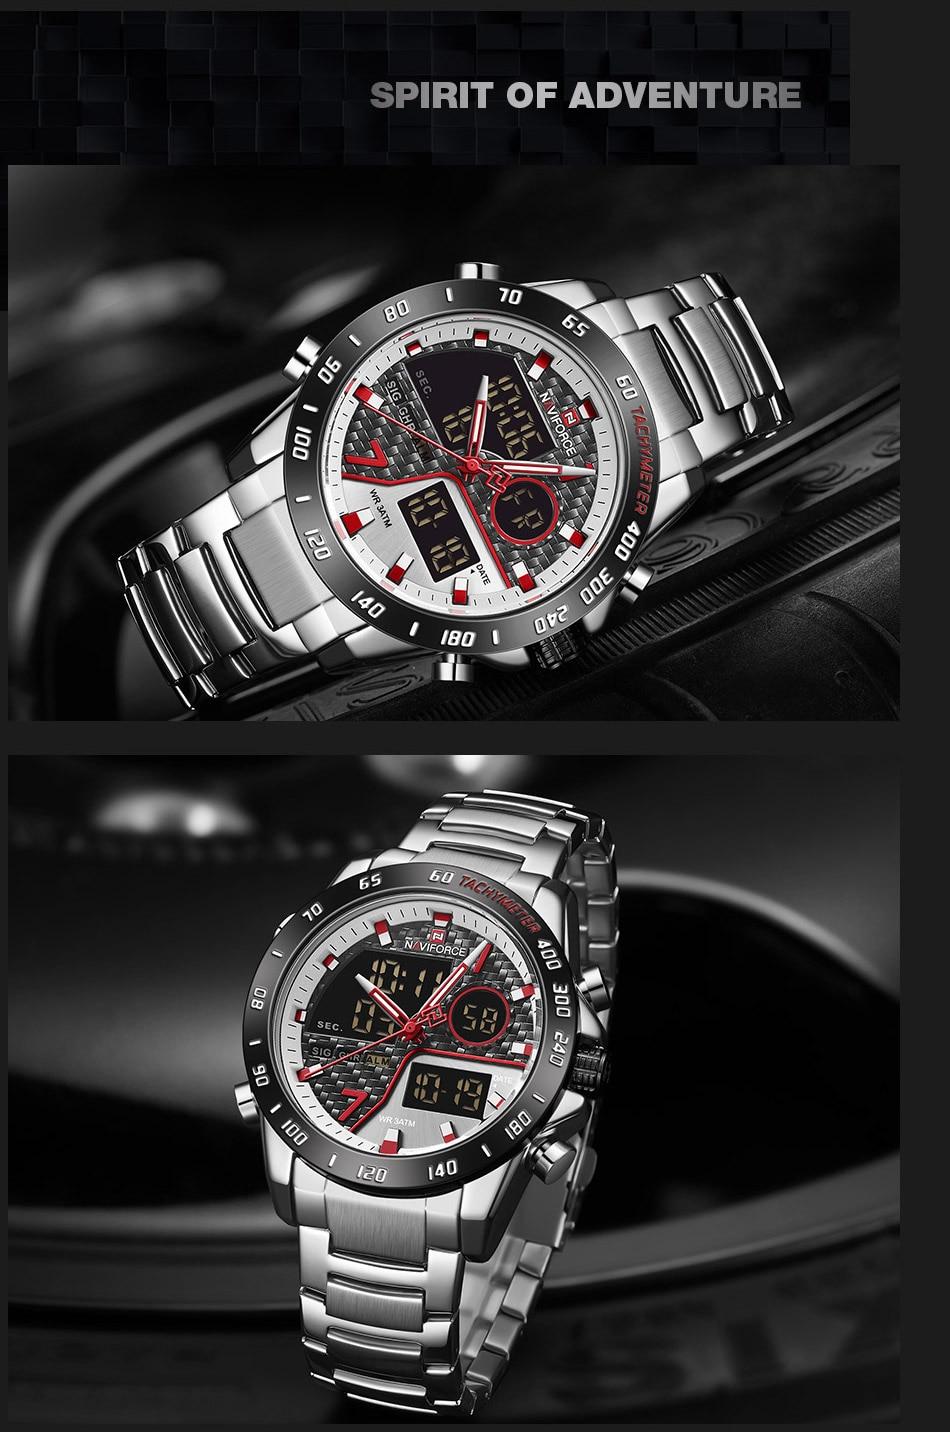 Hfdece4f7e1584c87911033a4fbb98009d NAVIFORCE Men Digital Watch LED Sport Military Mens Quartz Wristwatch Male Luminous Waterproof Clock Watches Relogio Masculino